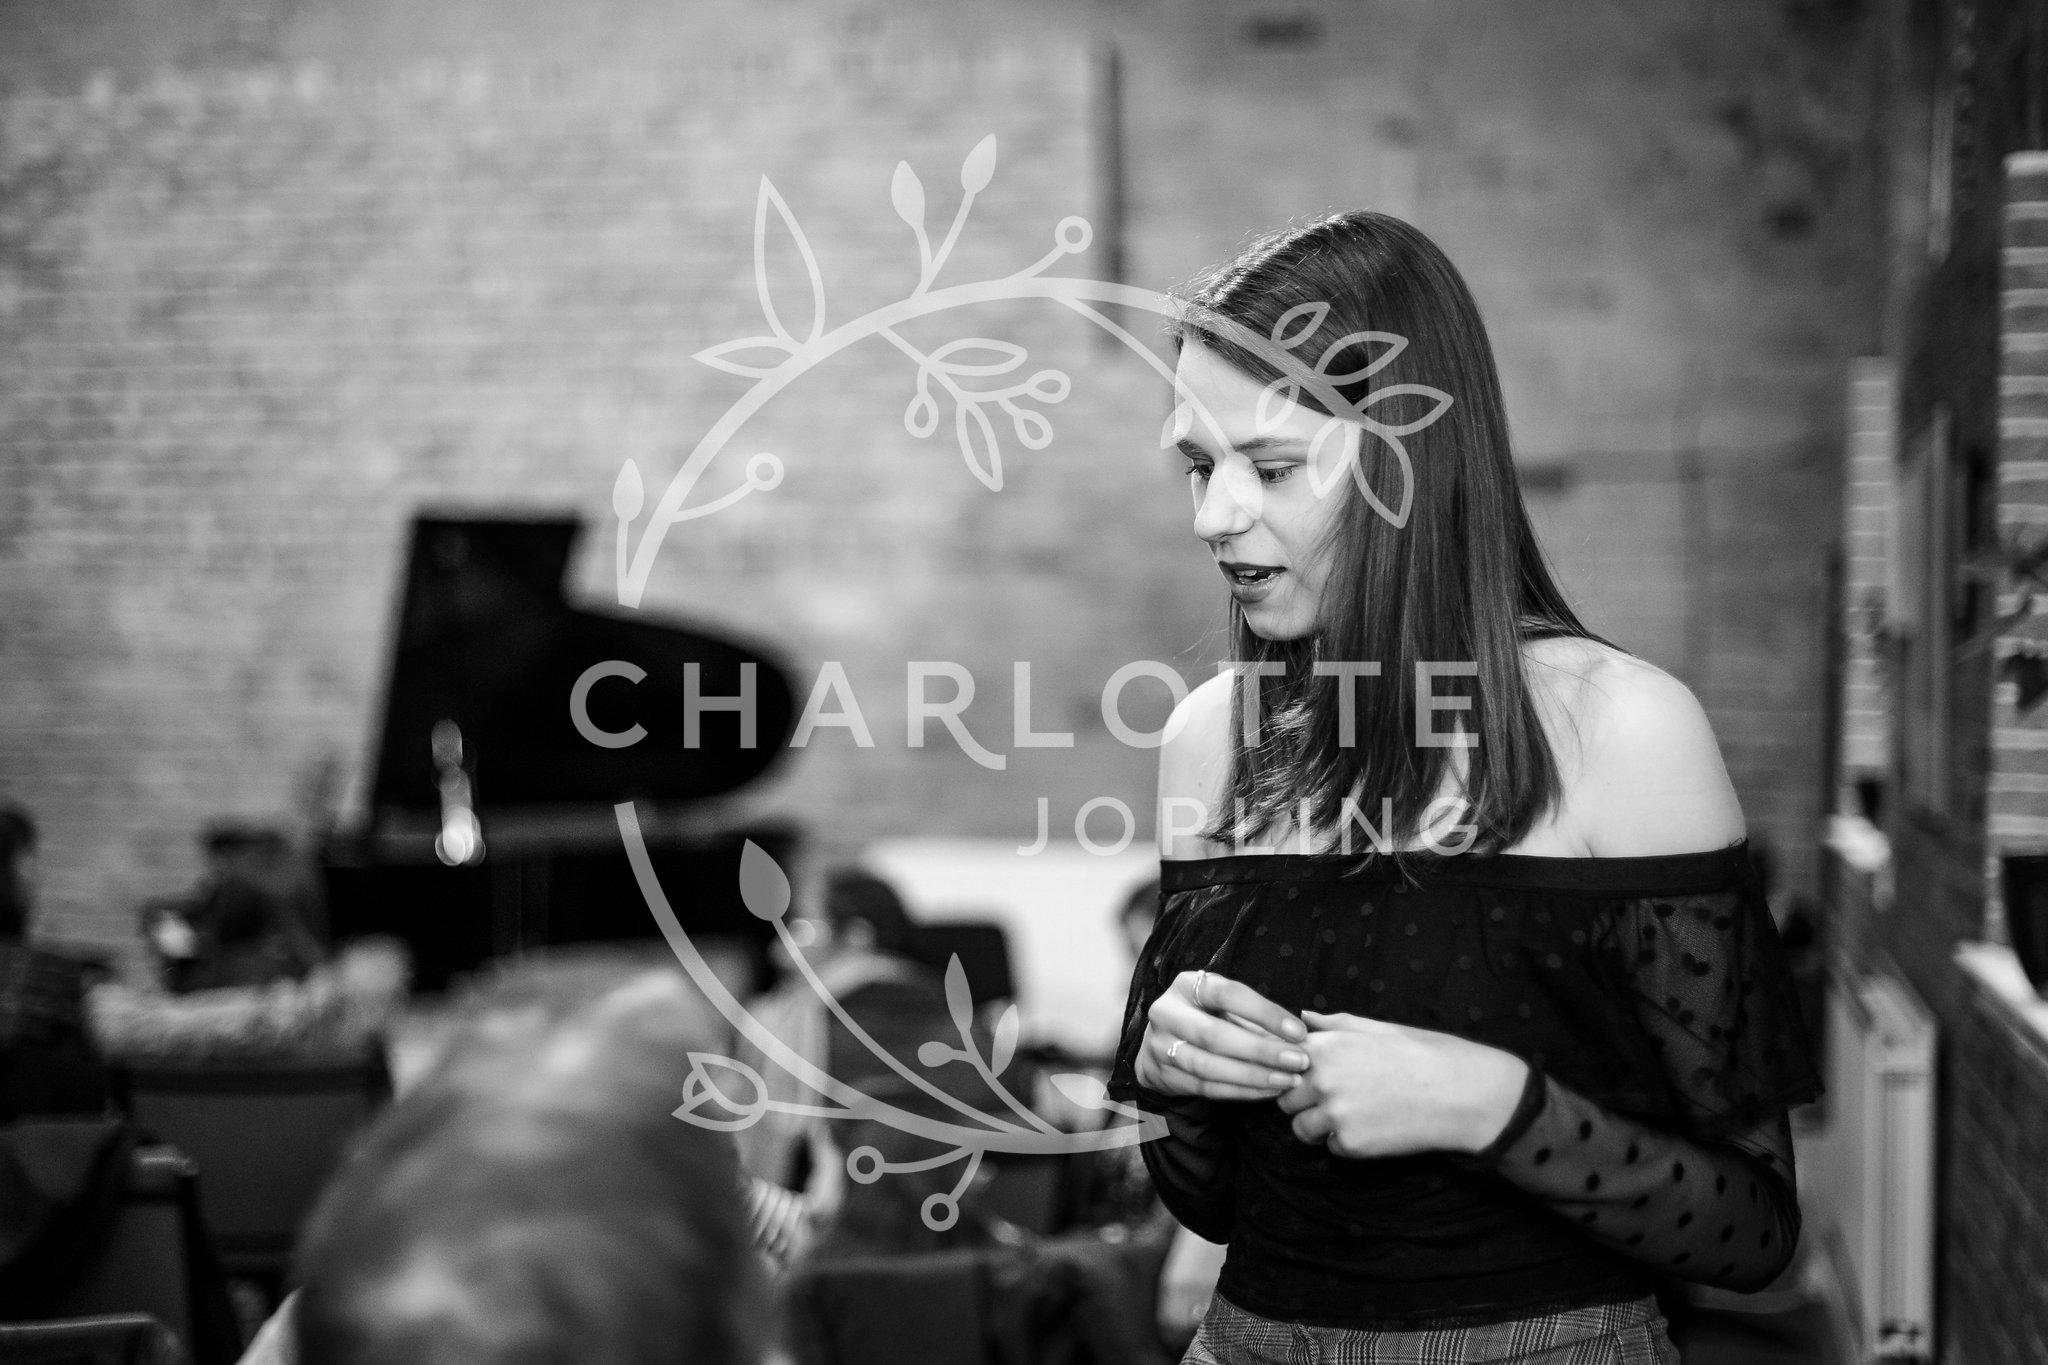 Stepping-Stones-Voicebox-Concert-2018-by-Charlotte-Jopling-49.jpg